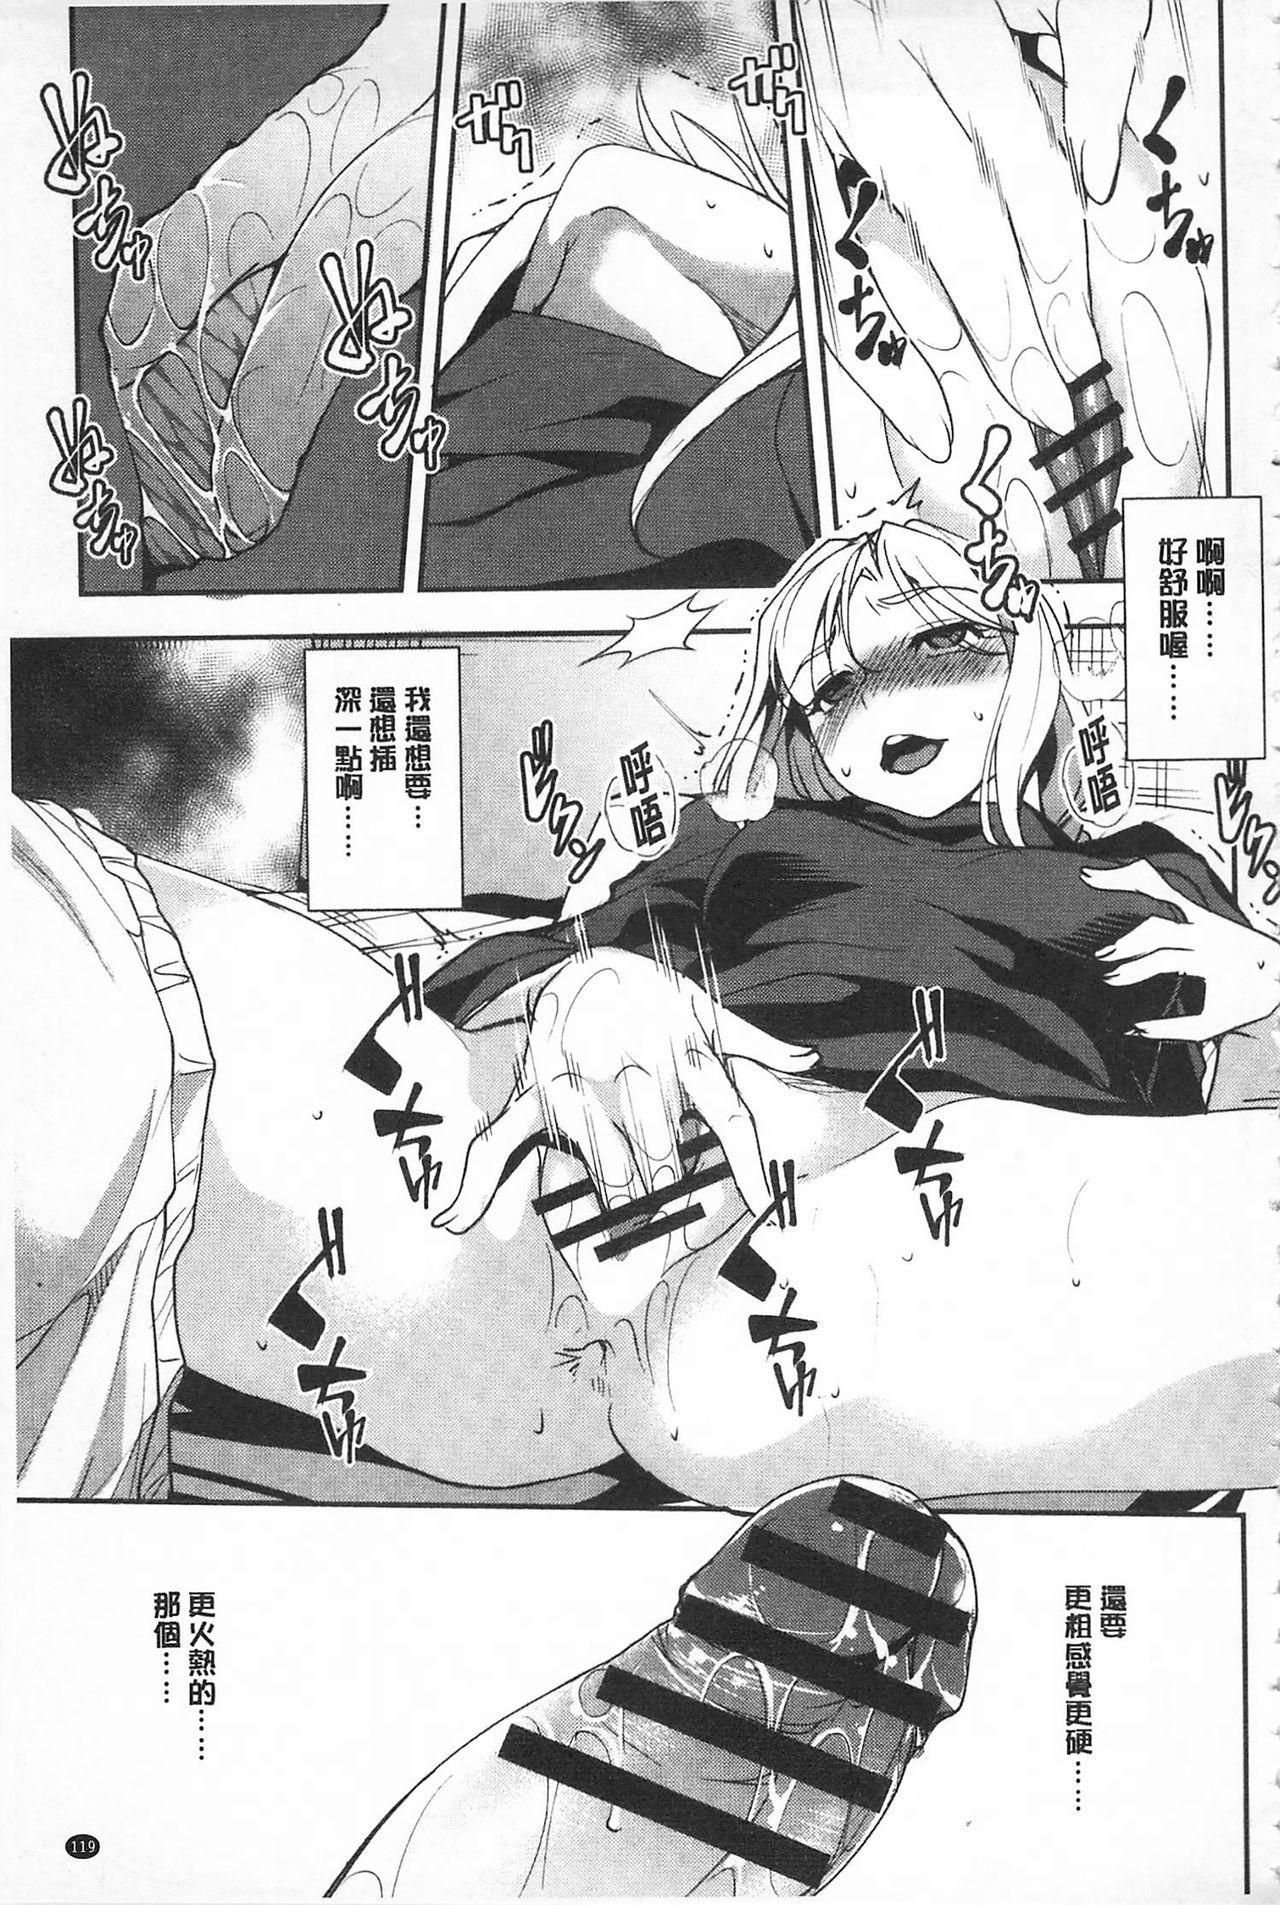 [Amano Kazumi] Seida Inyou -Seijo no Katachi Shita Intou- | 聖墮陰陽 -聖女的容貌與淫蕩- [Chinese] 122